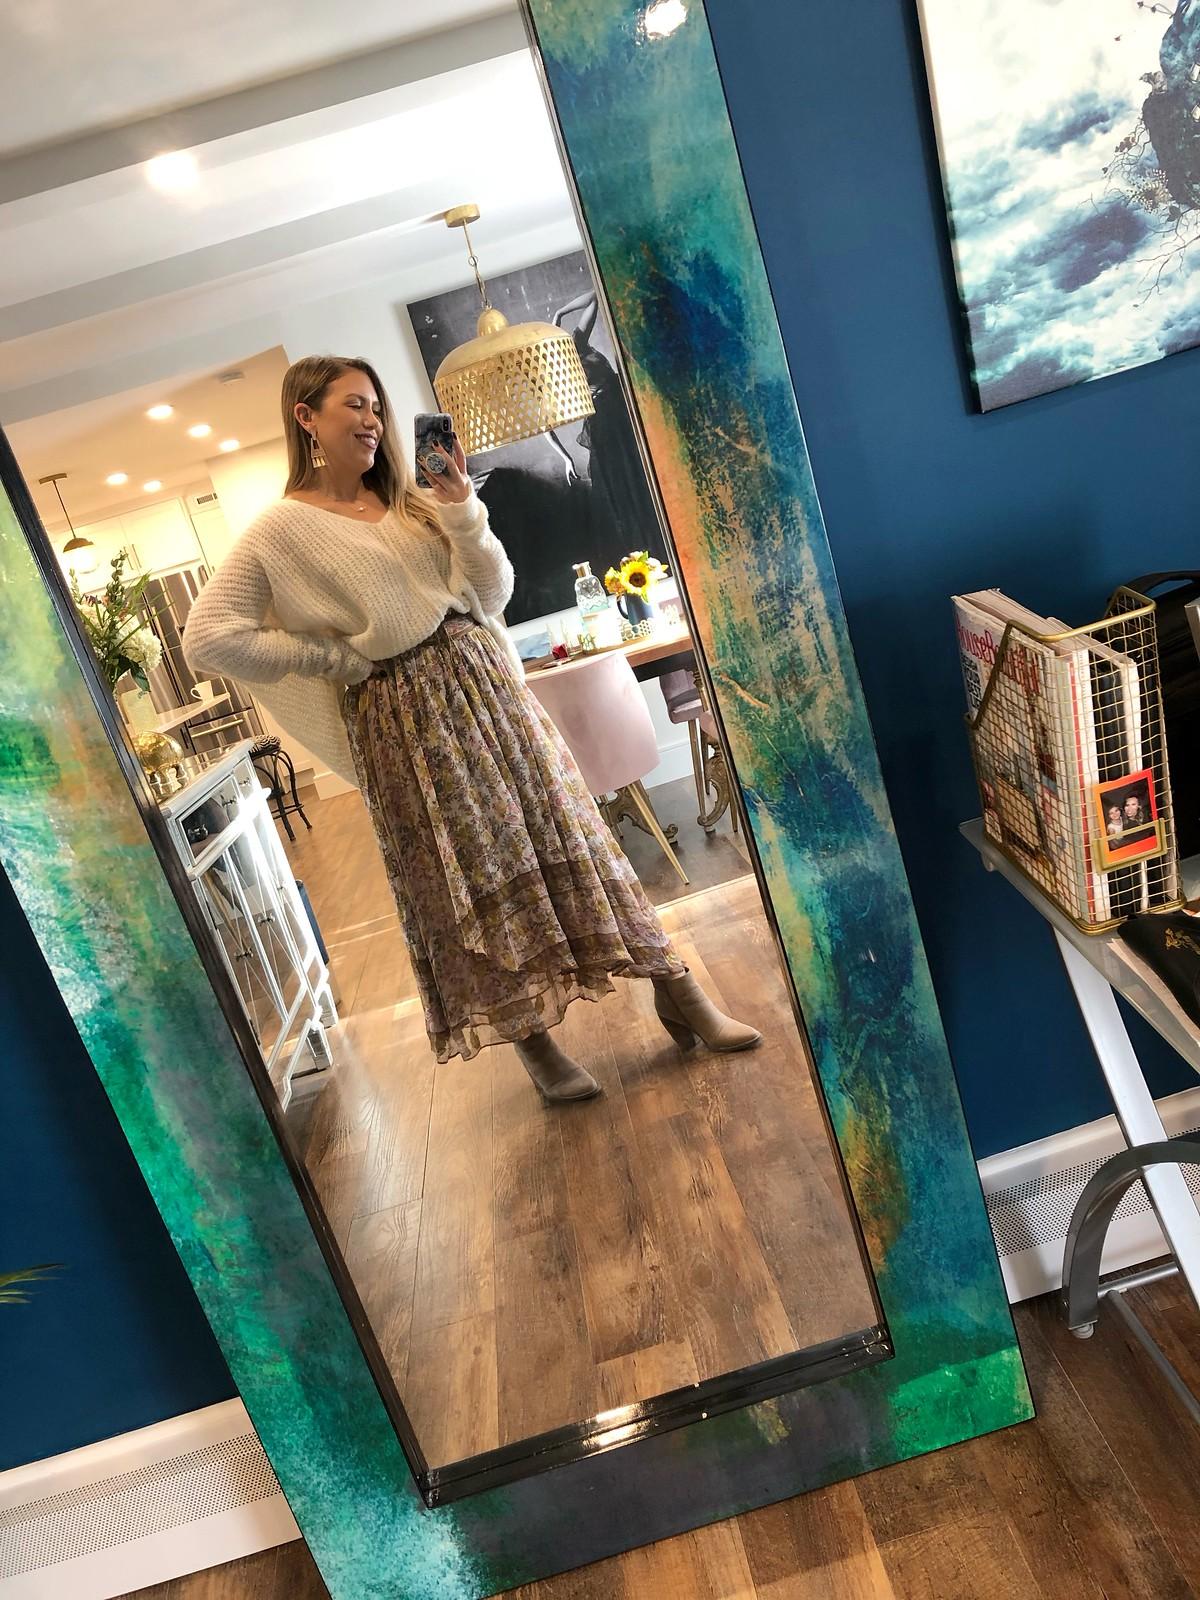 Love Sam Harvest Midi Skirt Daily Mirror Outfit